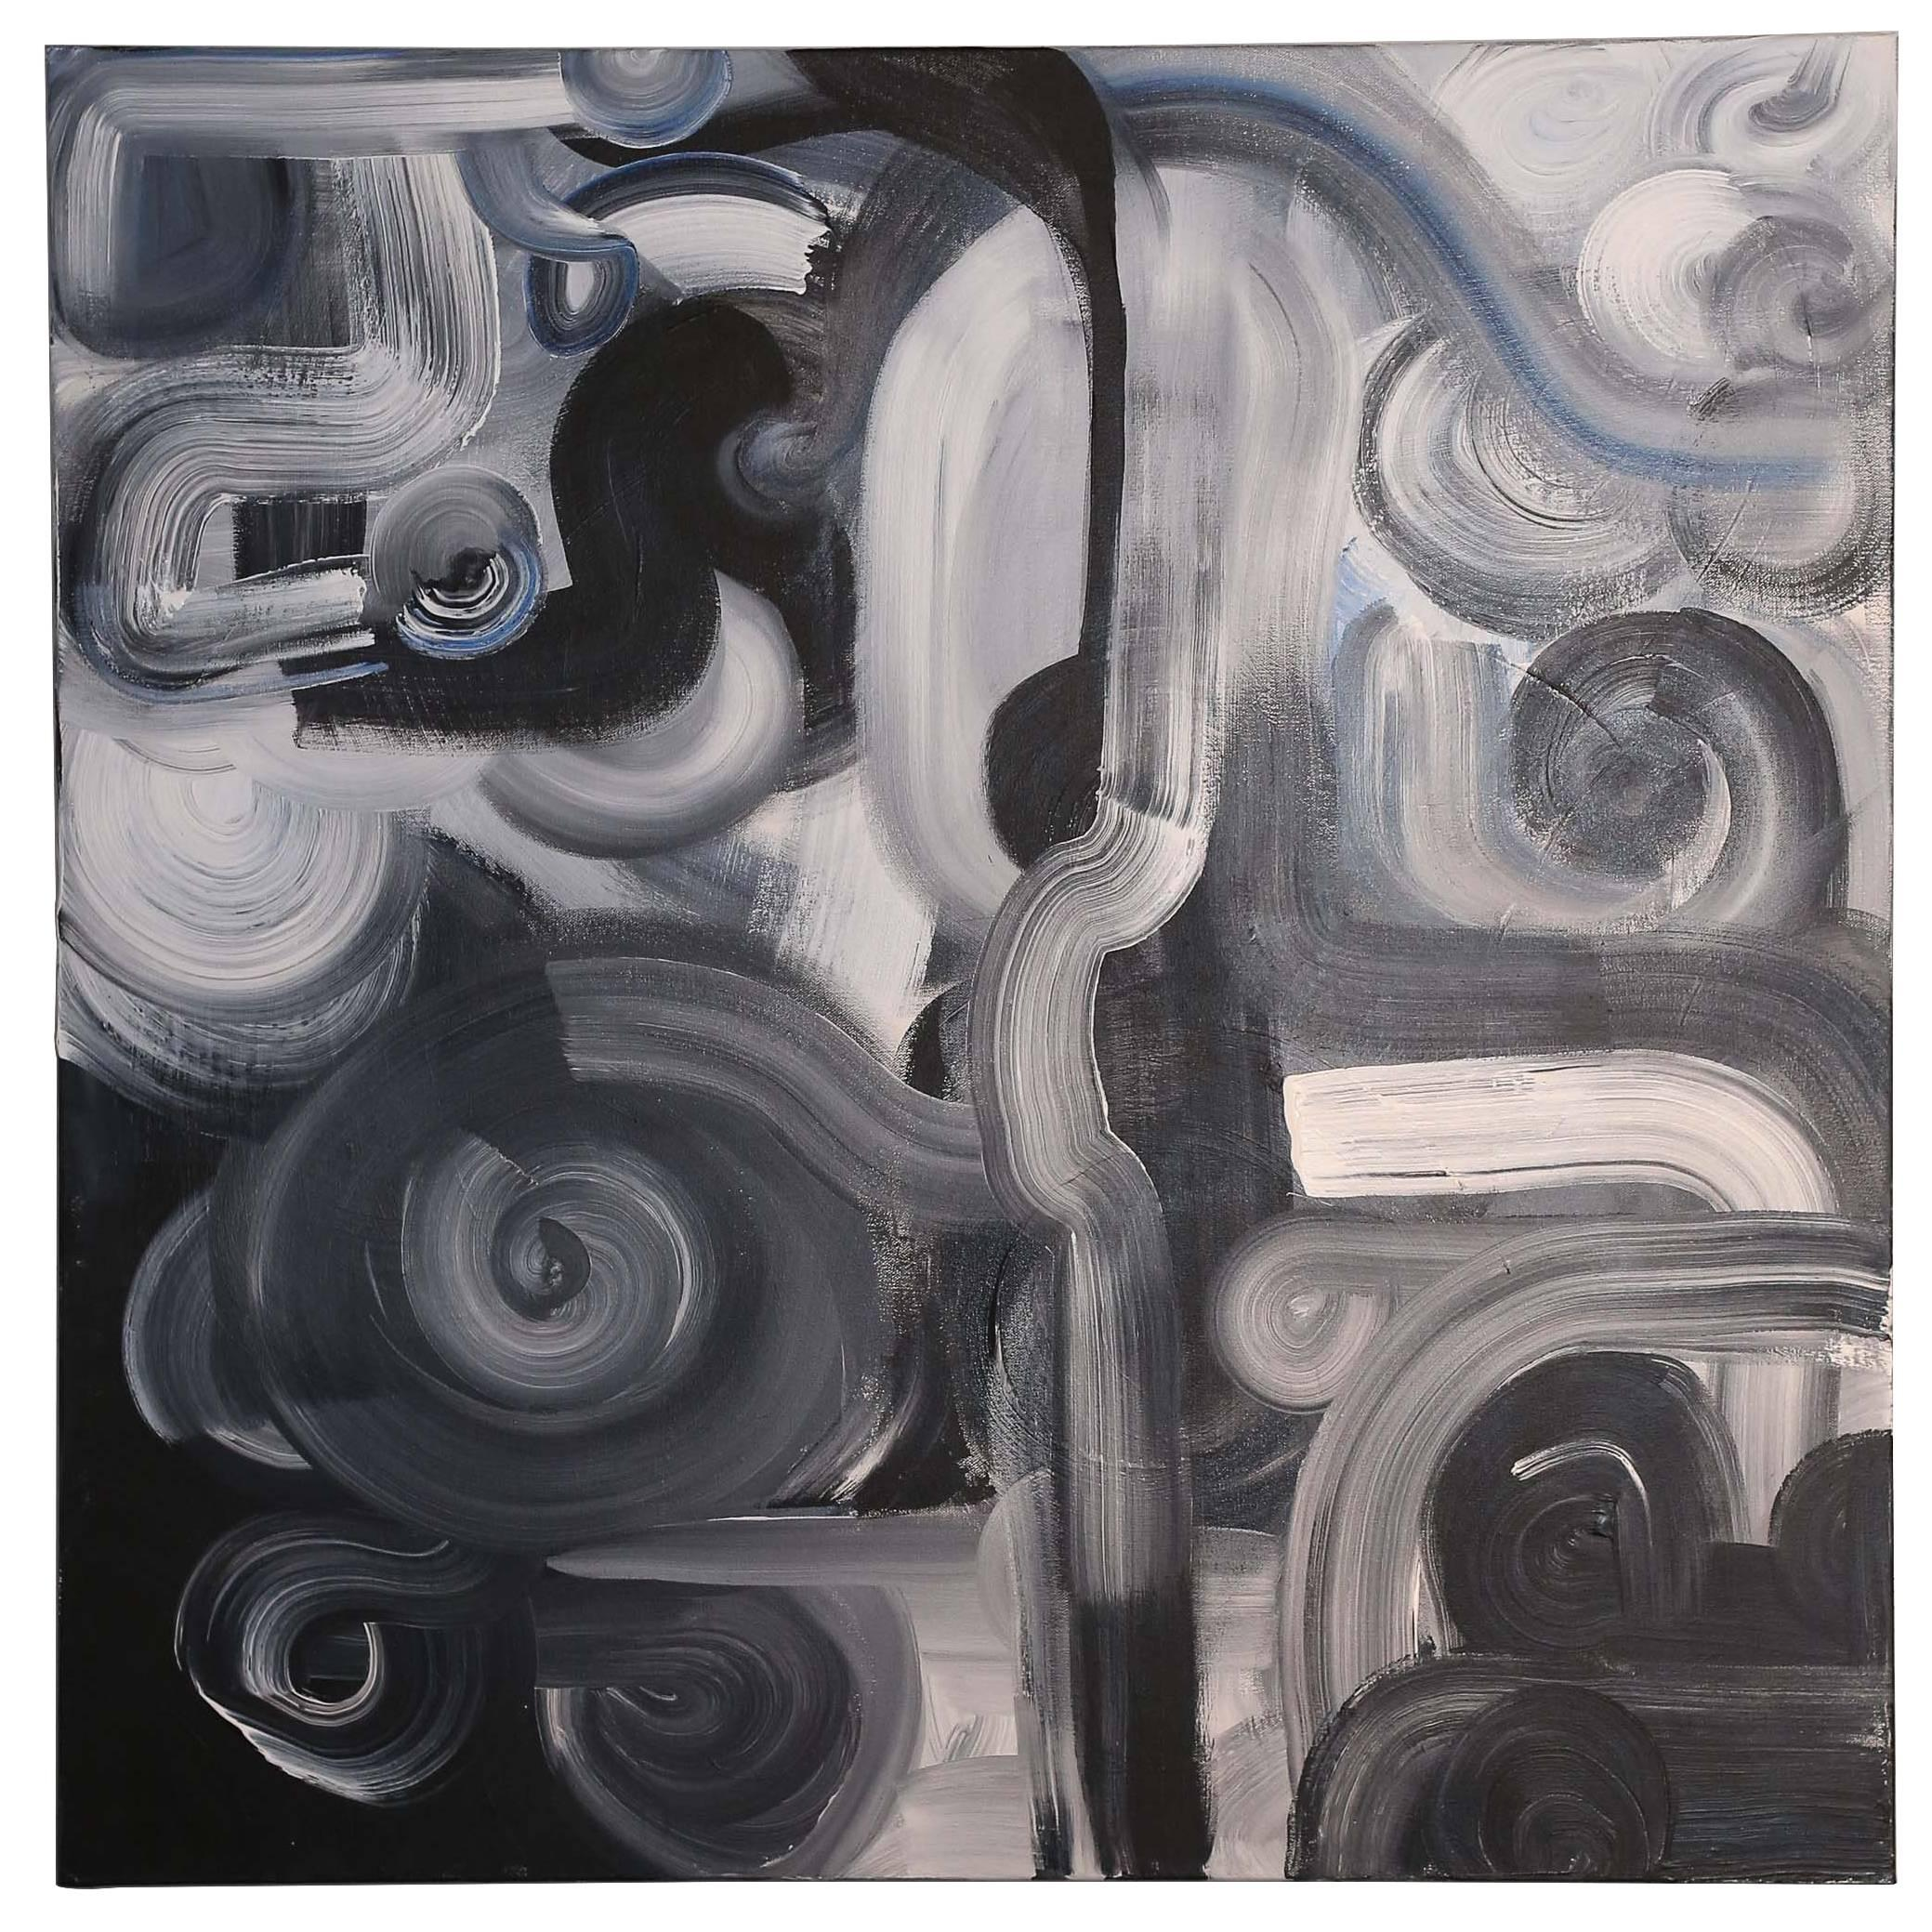 2016 Mixed-Media on Canvas by Texas Artist Chanel Kaposta